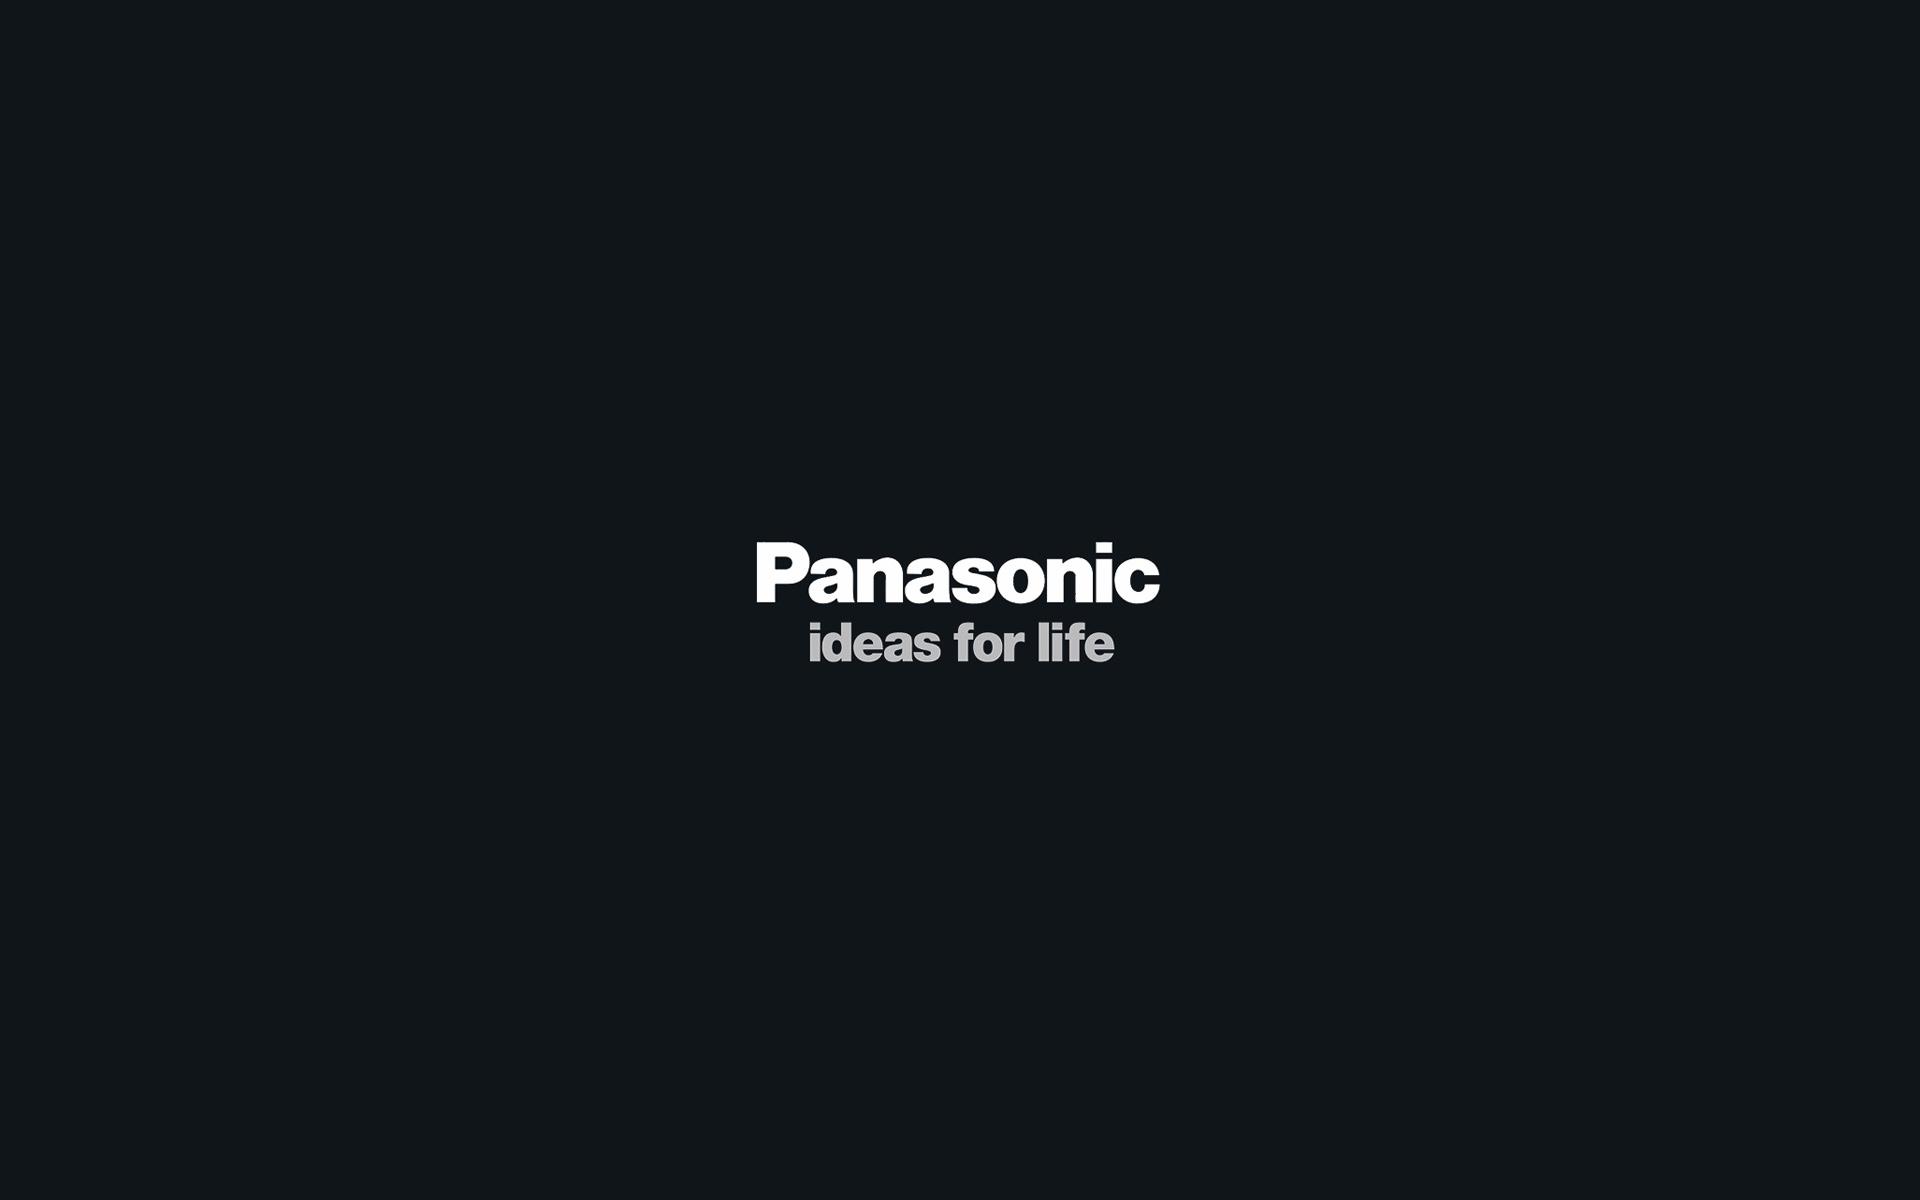 Online community for Panasonic.